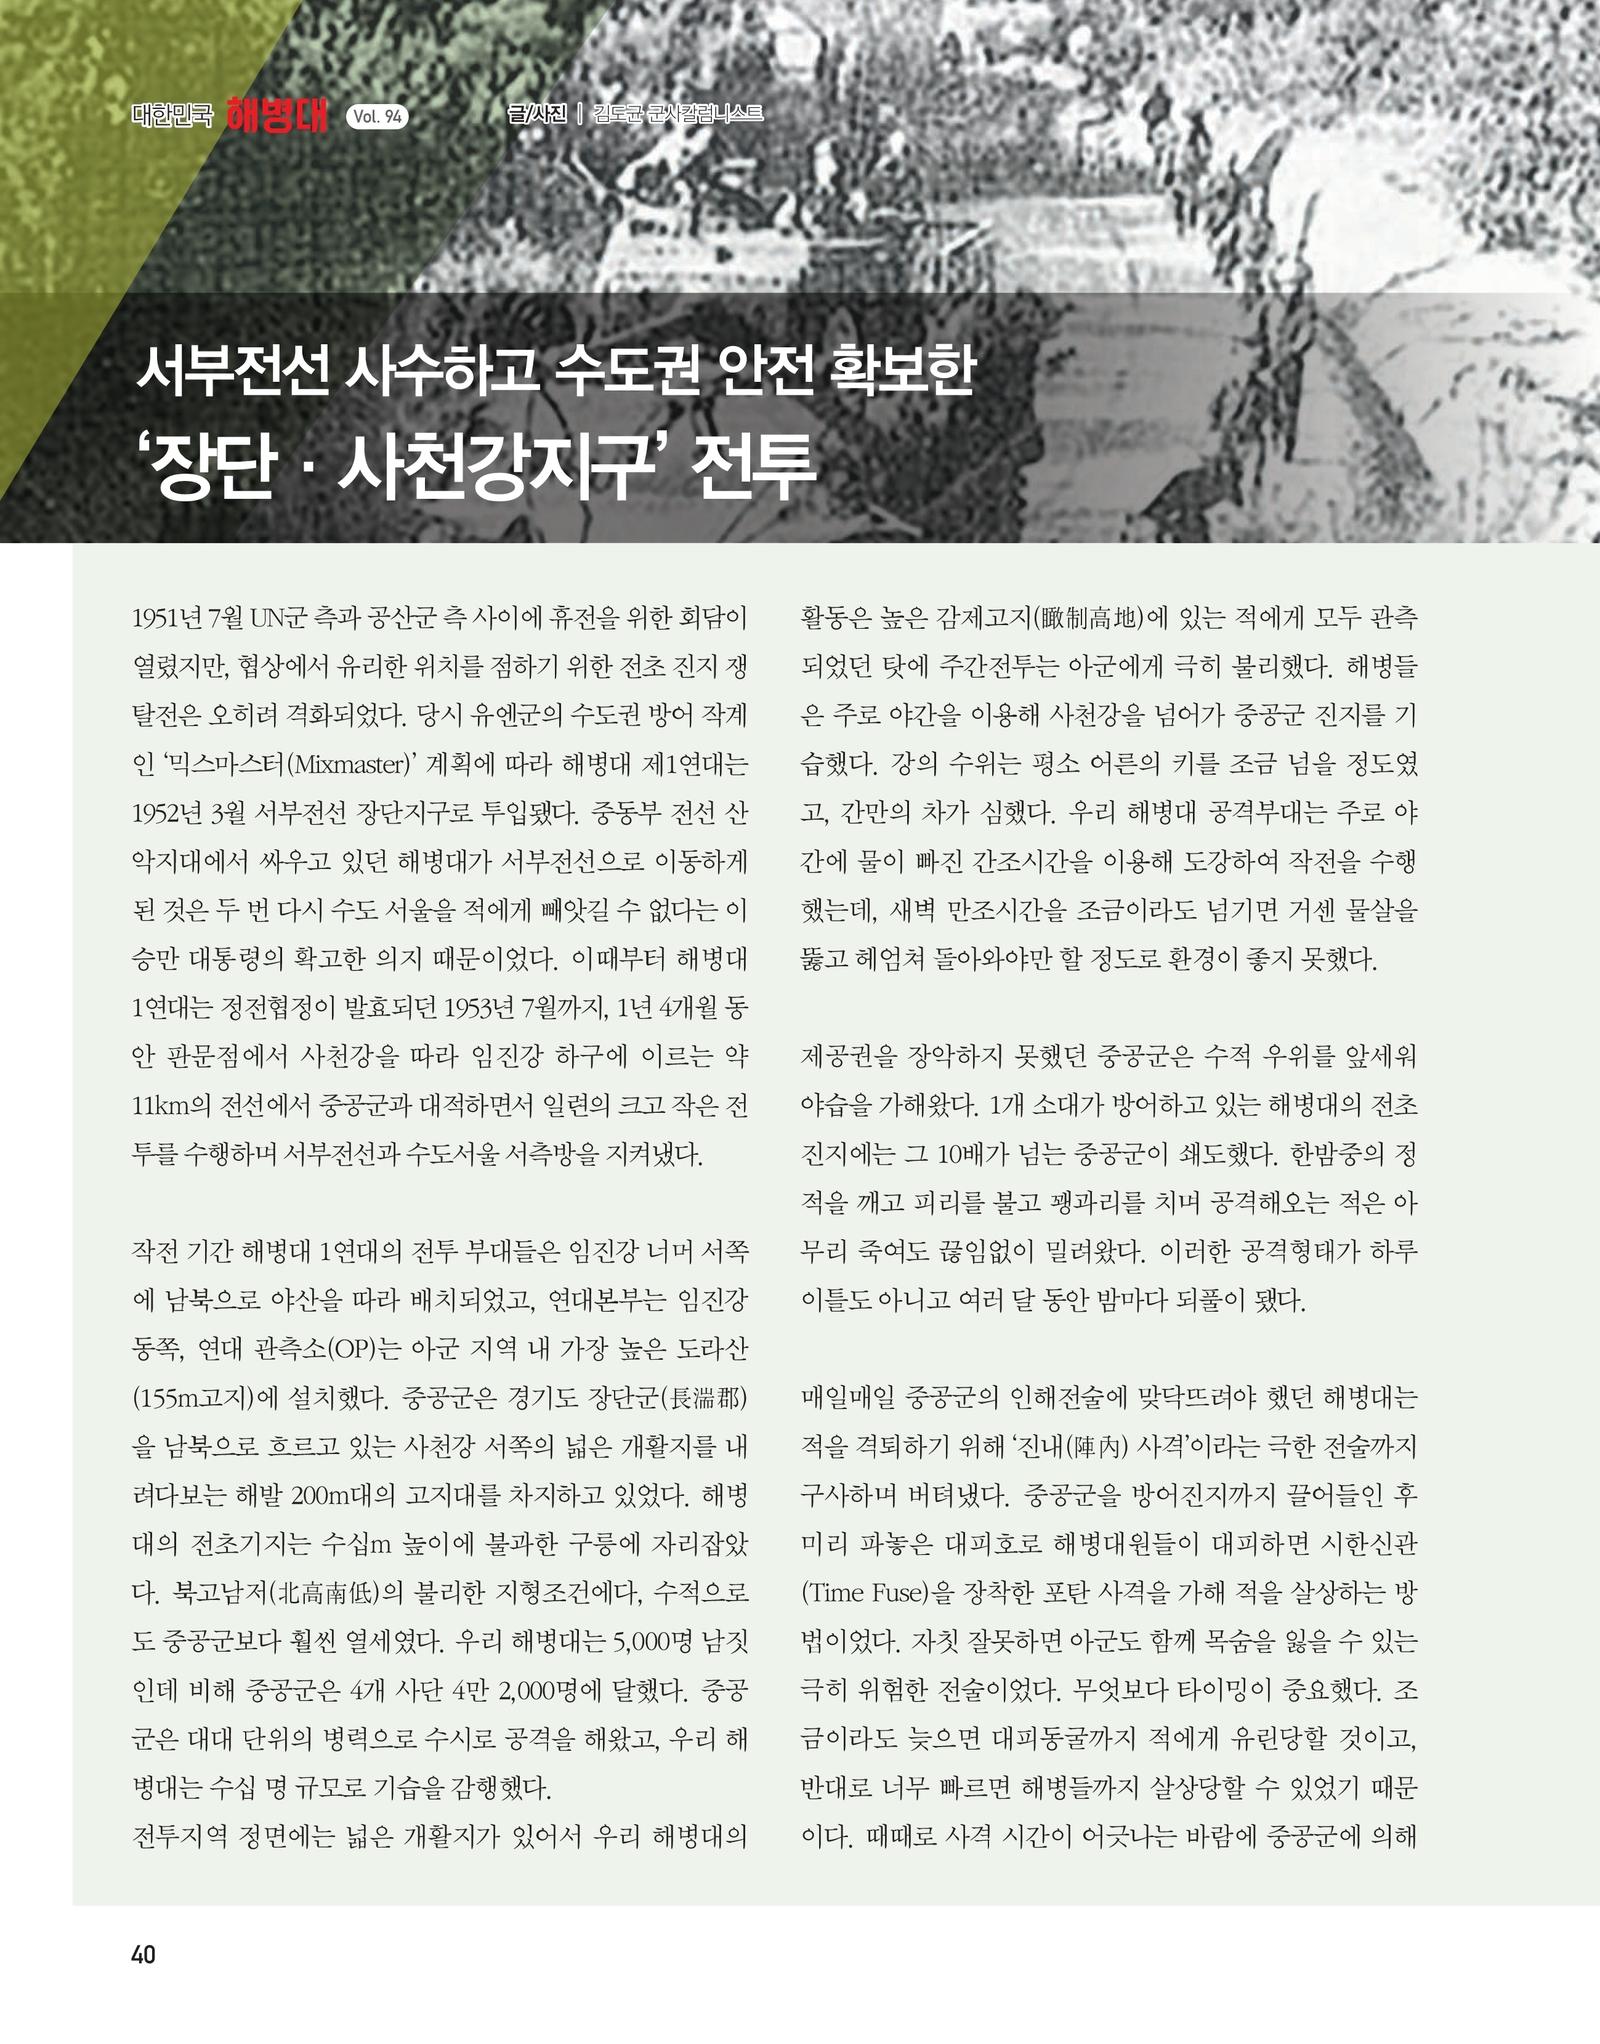 page-134083-0042.jpg